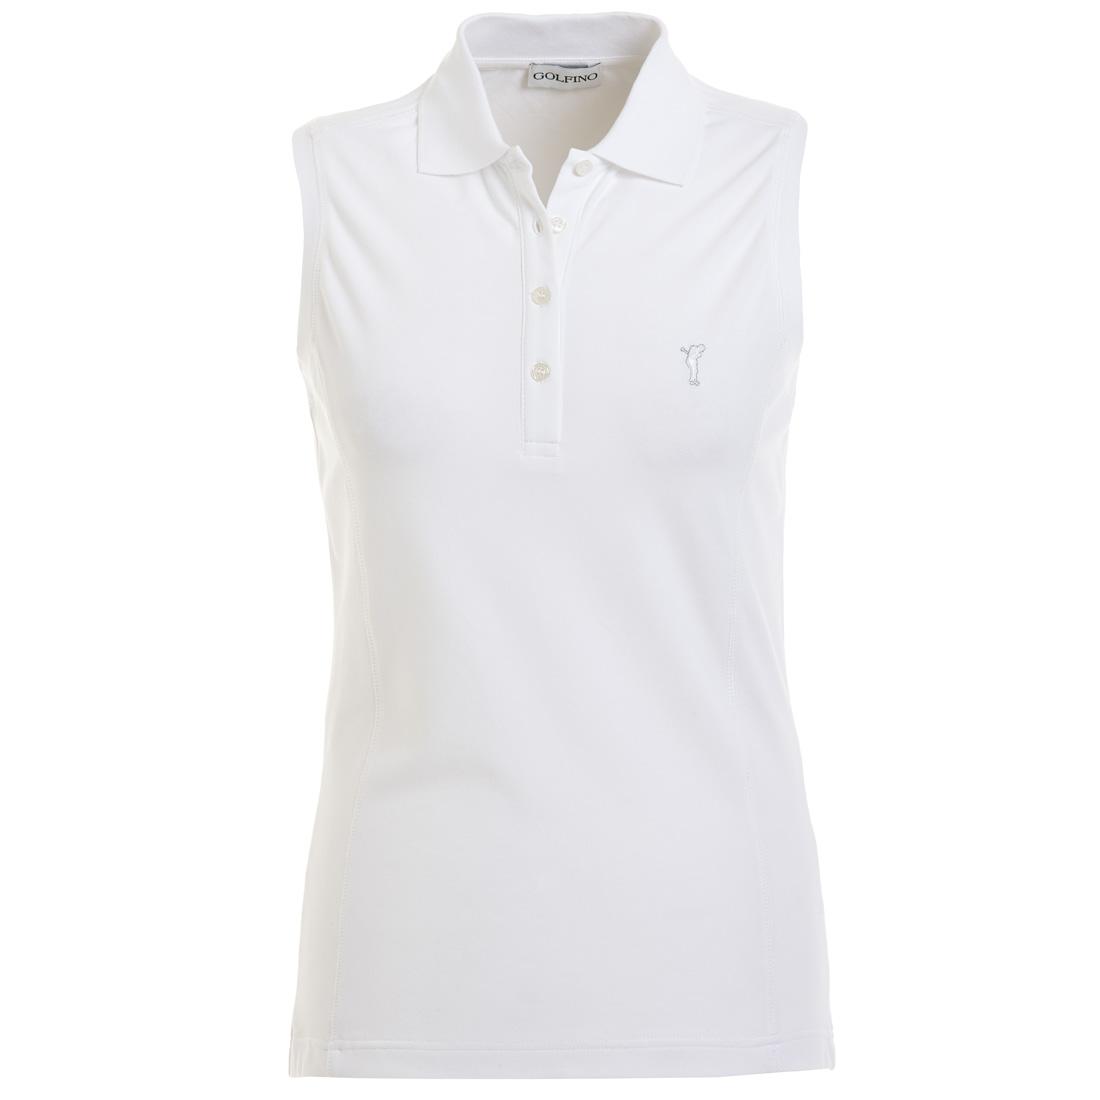 Ärmelloses Damen Golfpolo mit Sonnenschutz-Funktion